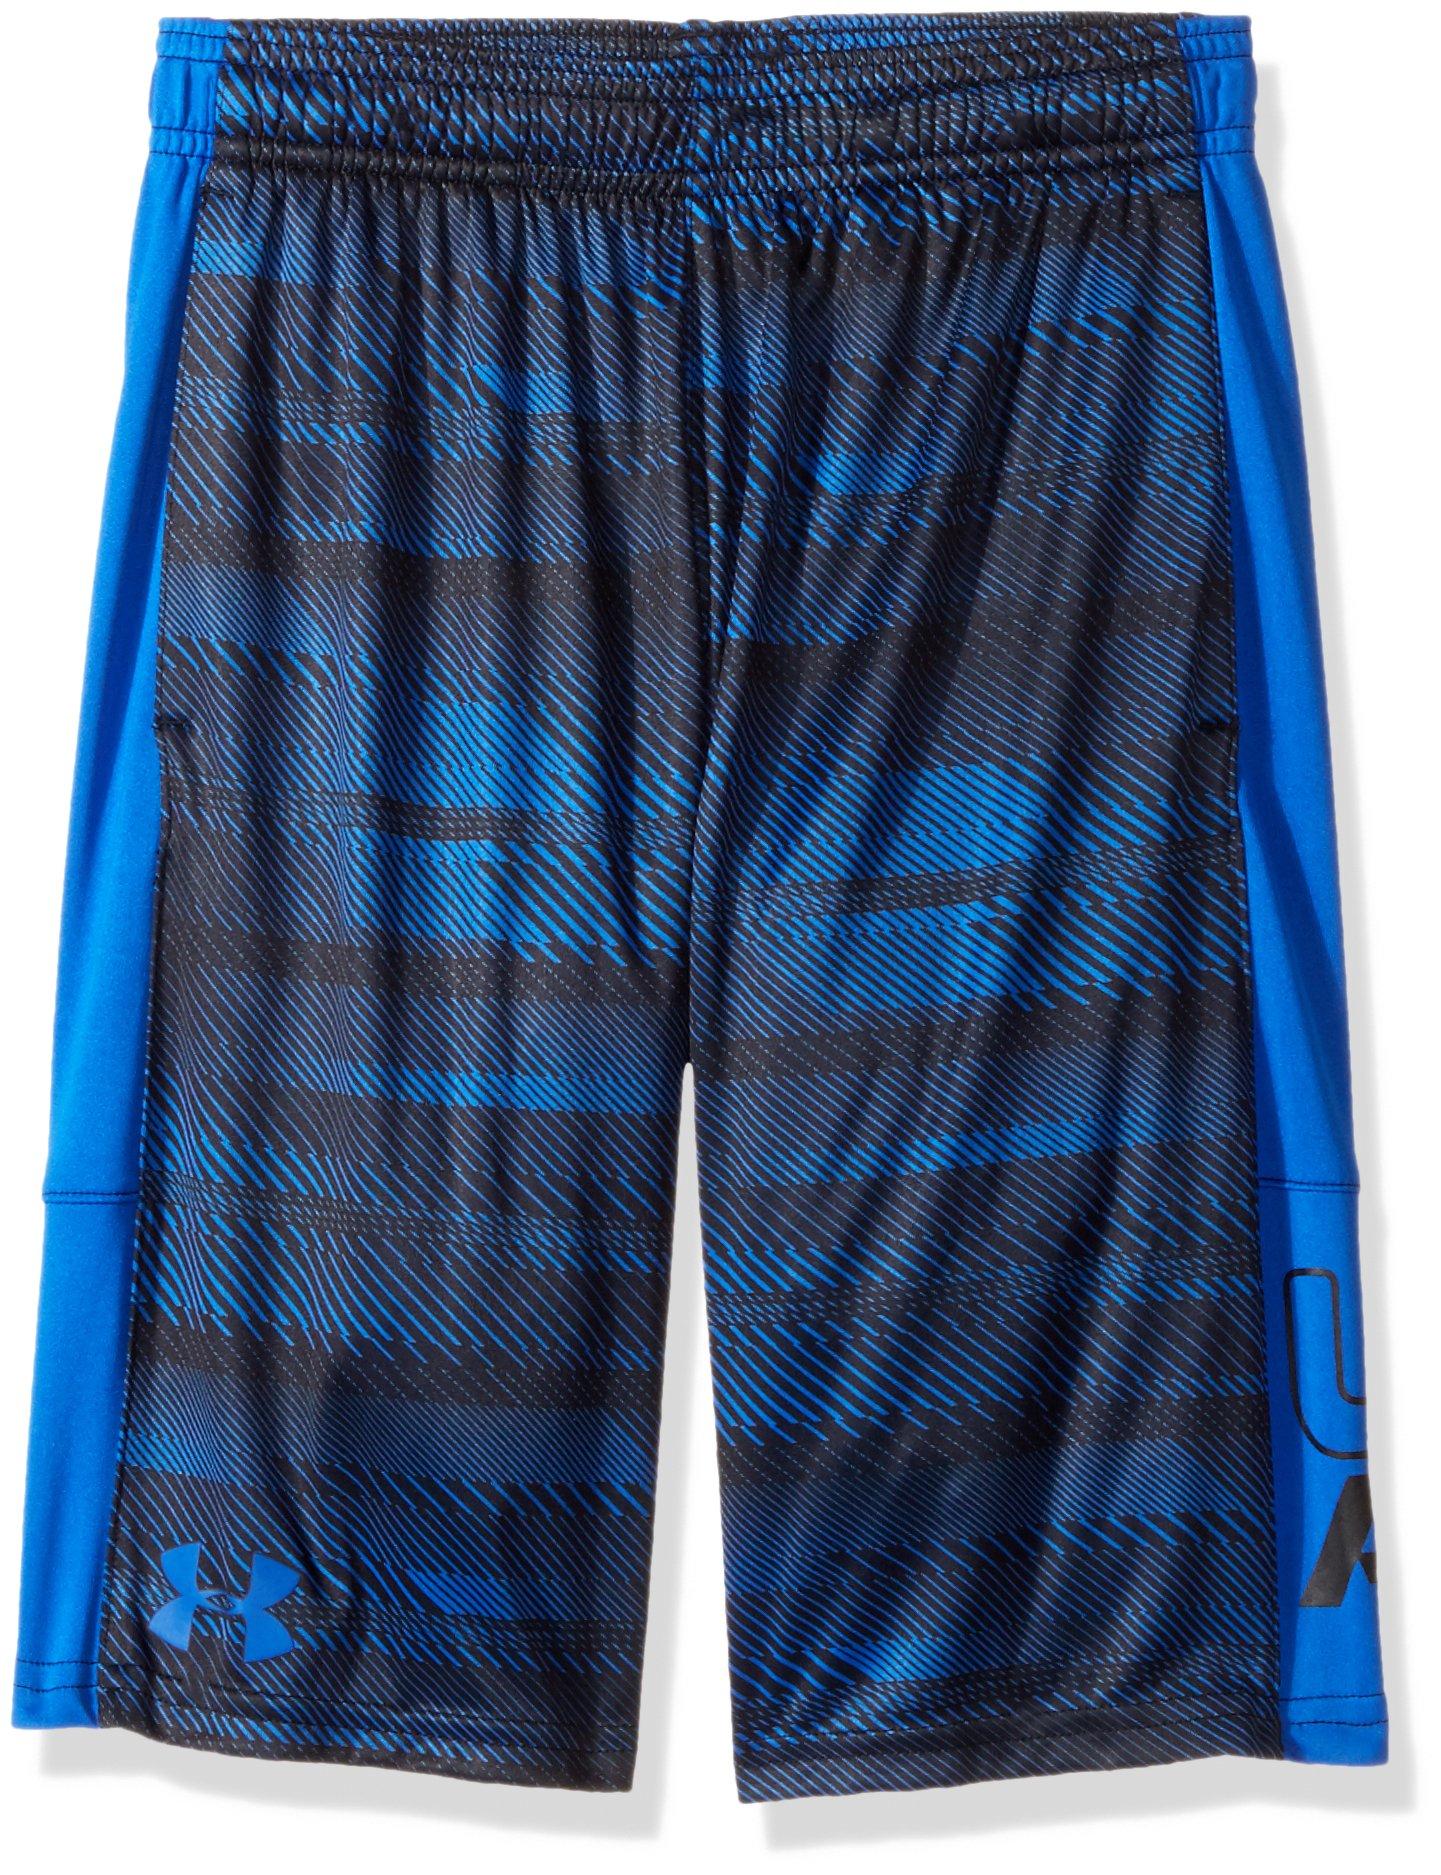 Under Armour Boys' Instinct Printed Shorts, Ultra Blue /Black Youth Medium